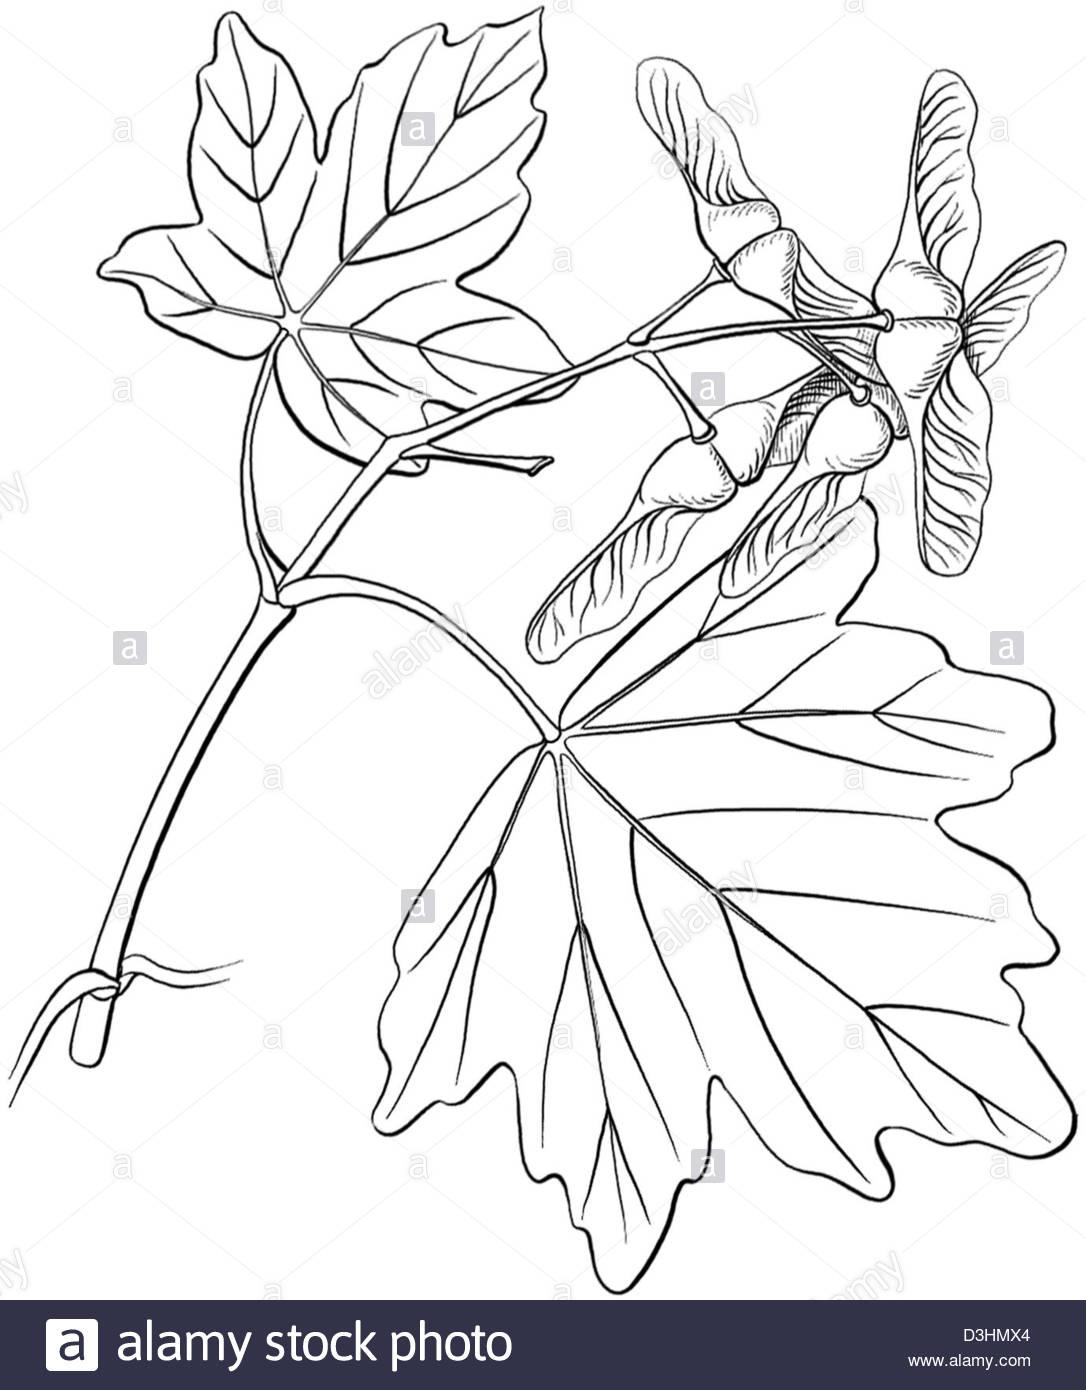 1086x1390 Field Maple, Drawing Stock Photo 53864668